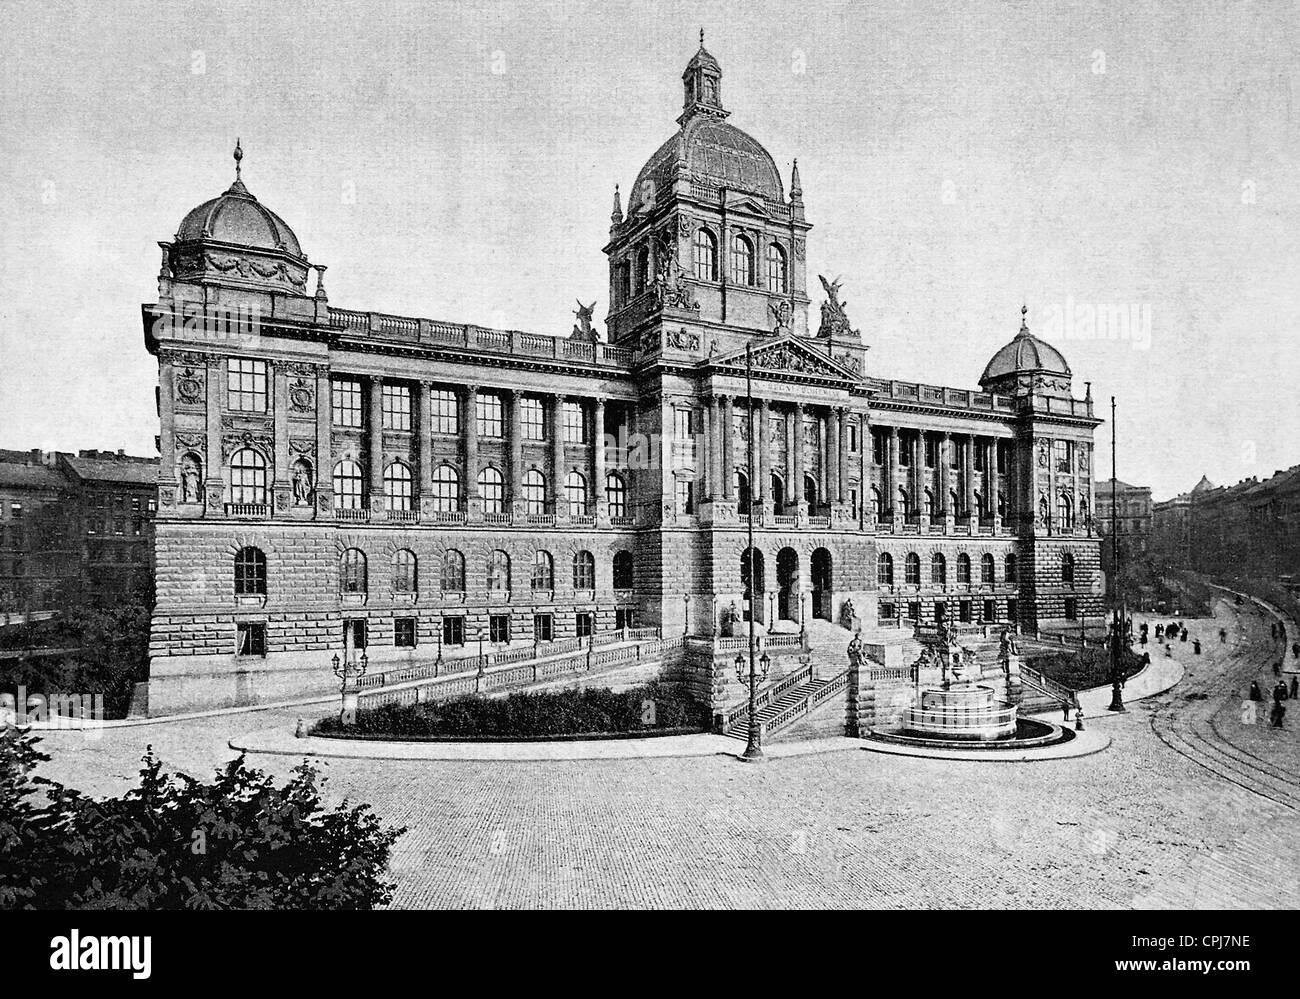 The Bohemian National Museum in Prague - Stock Image